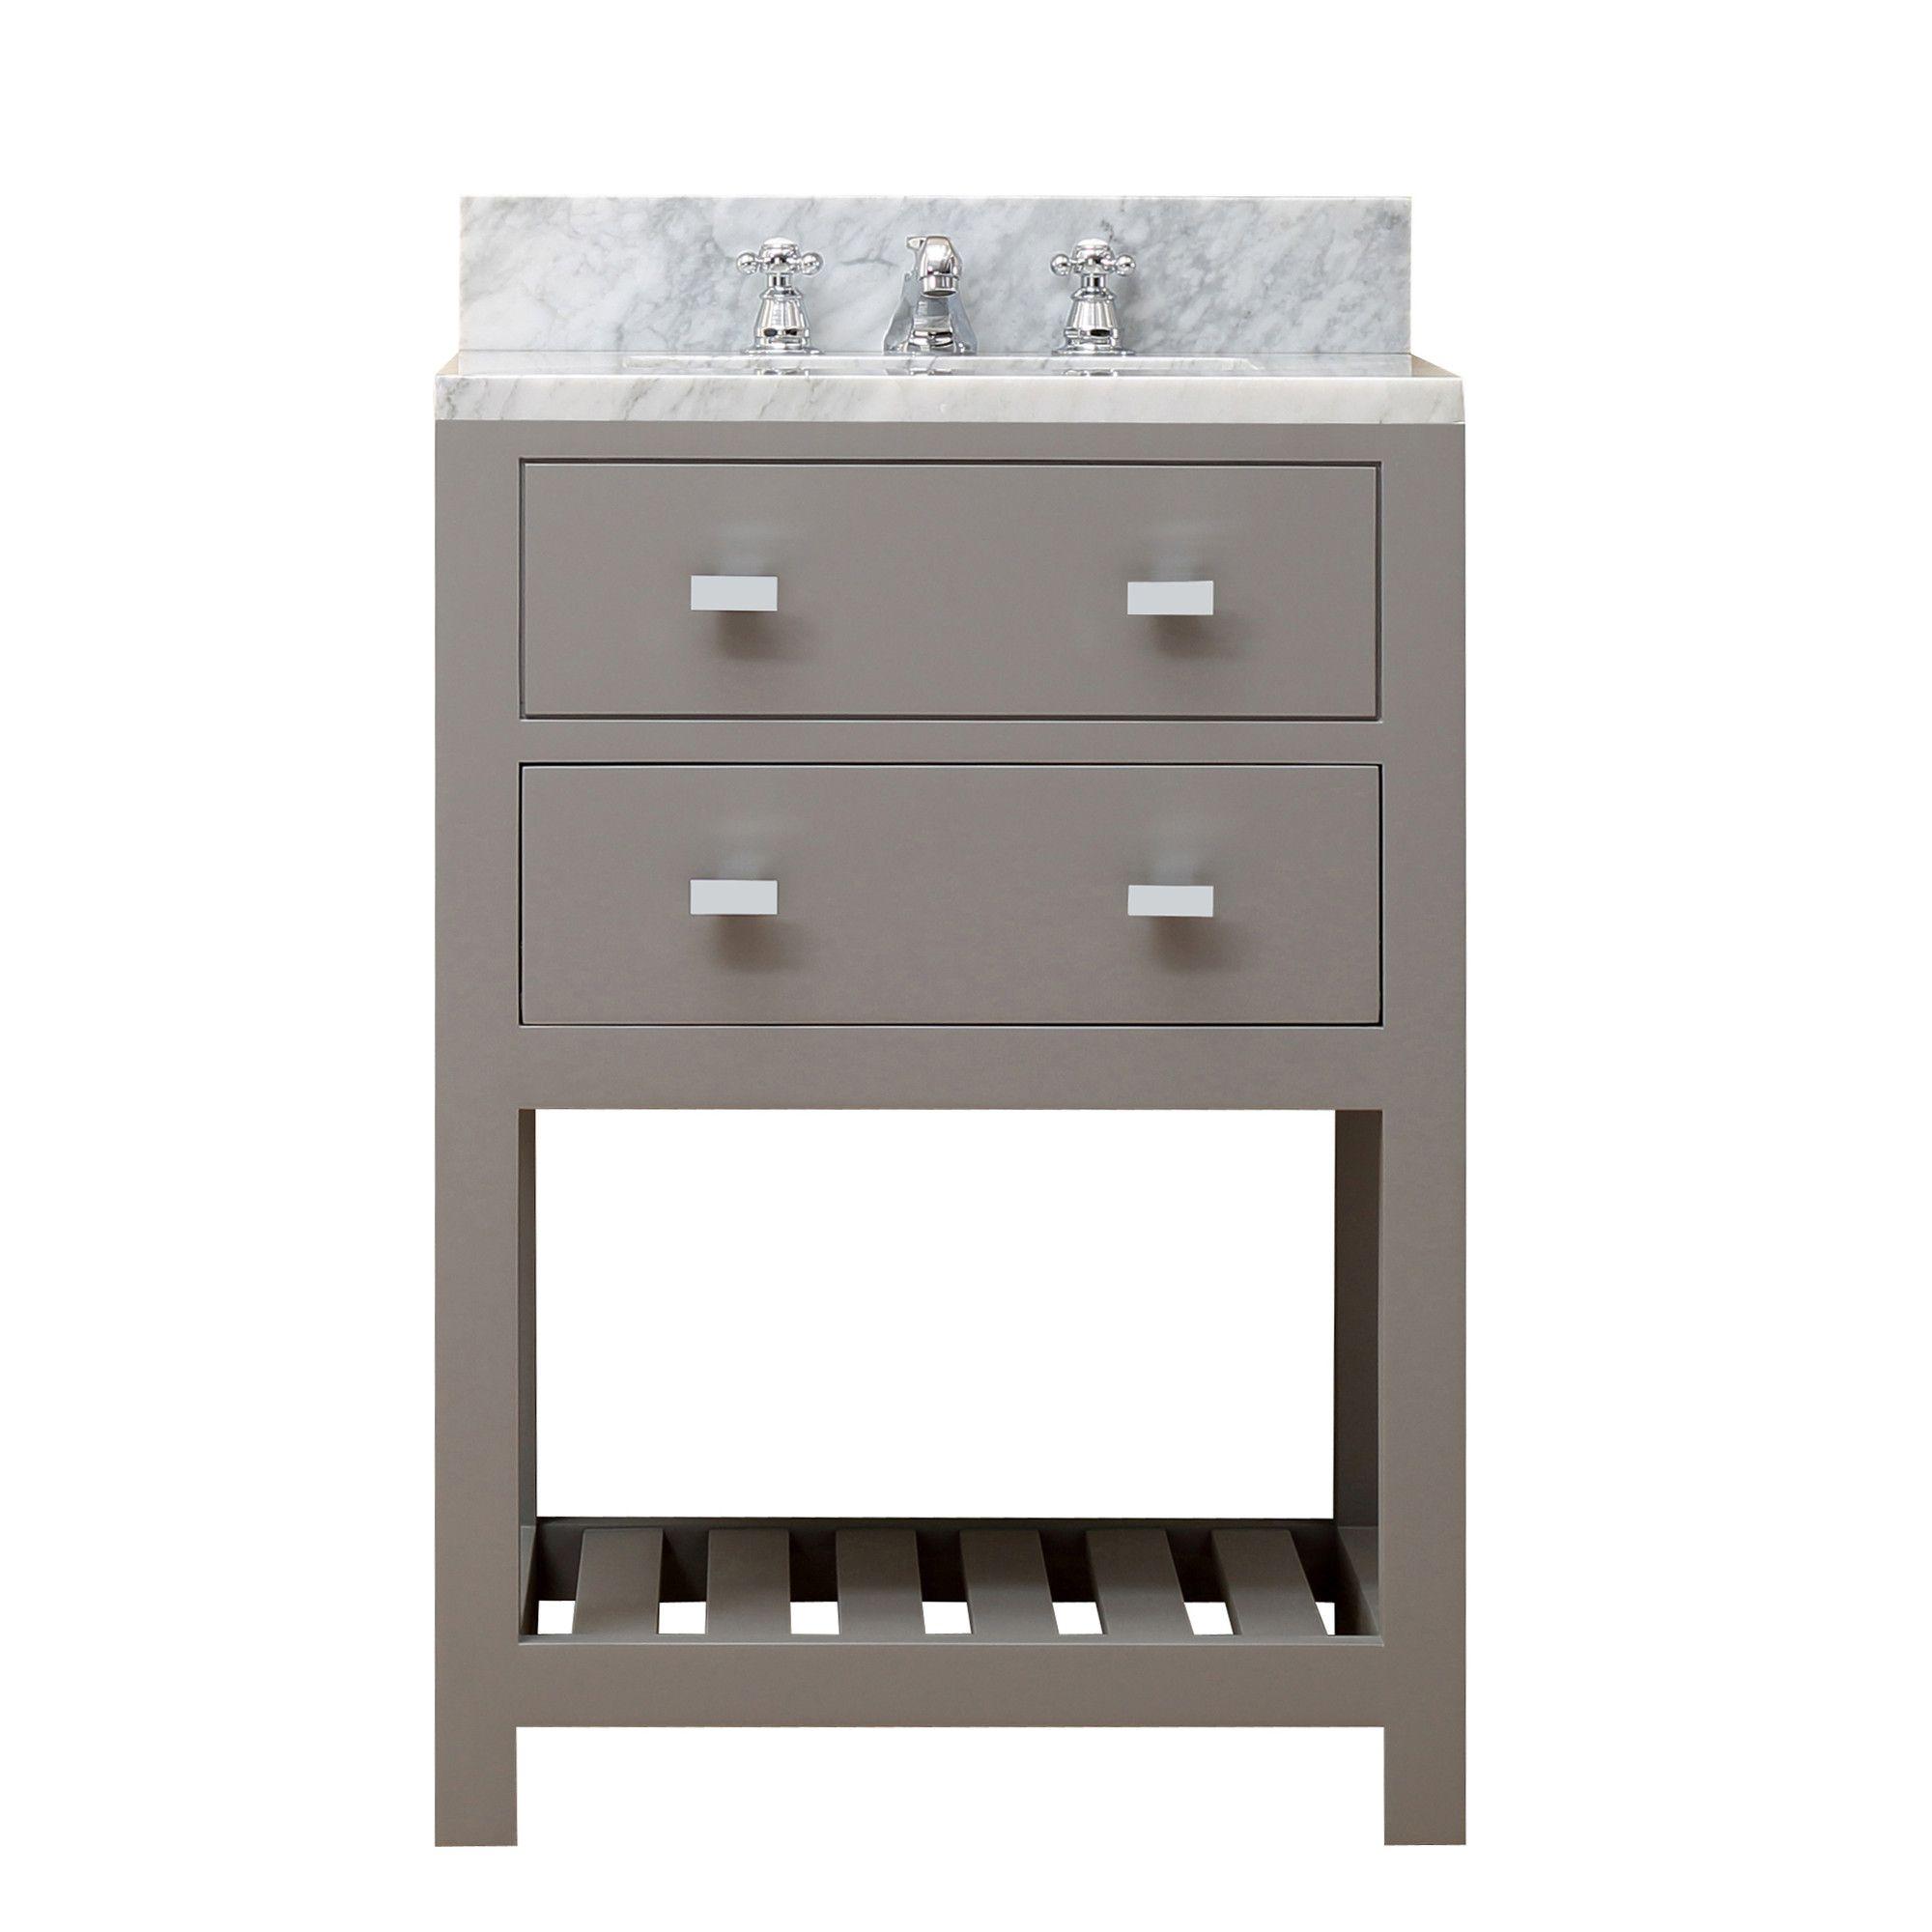 "dCOR design Creighton 24"" Single Sink Bathroom Vanity Set"